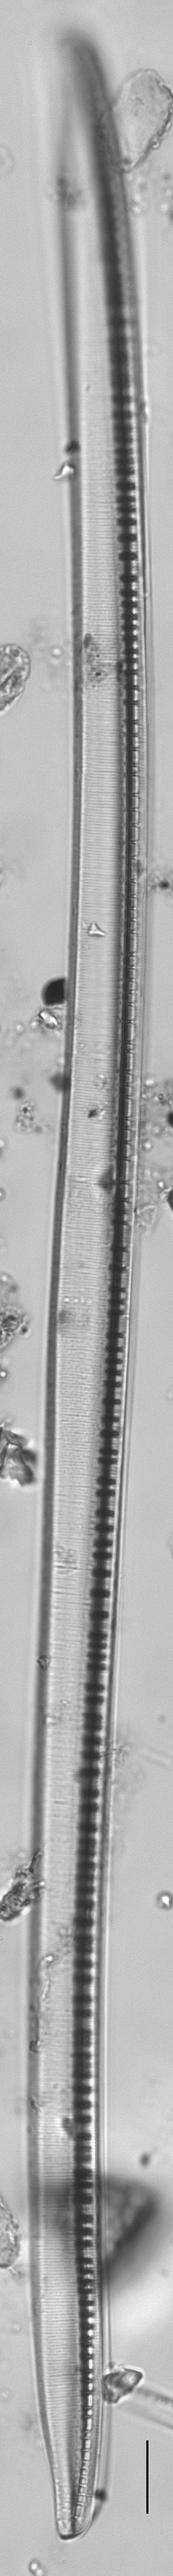 Nitzschia sigmoidea LM1